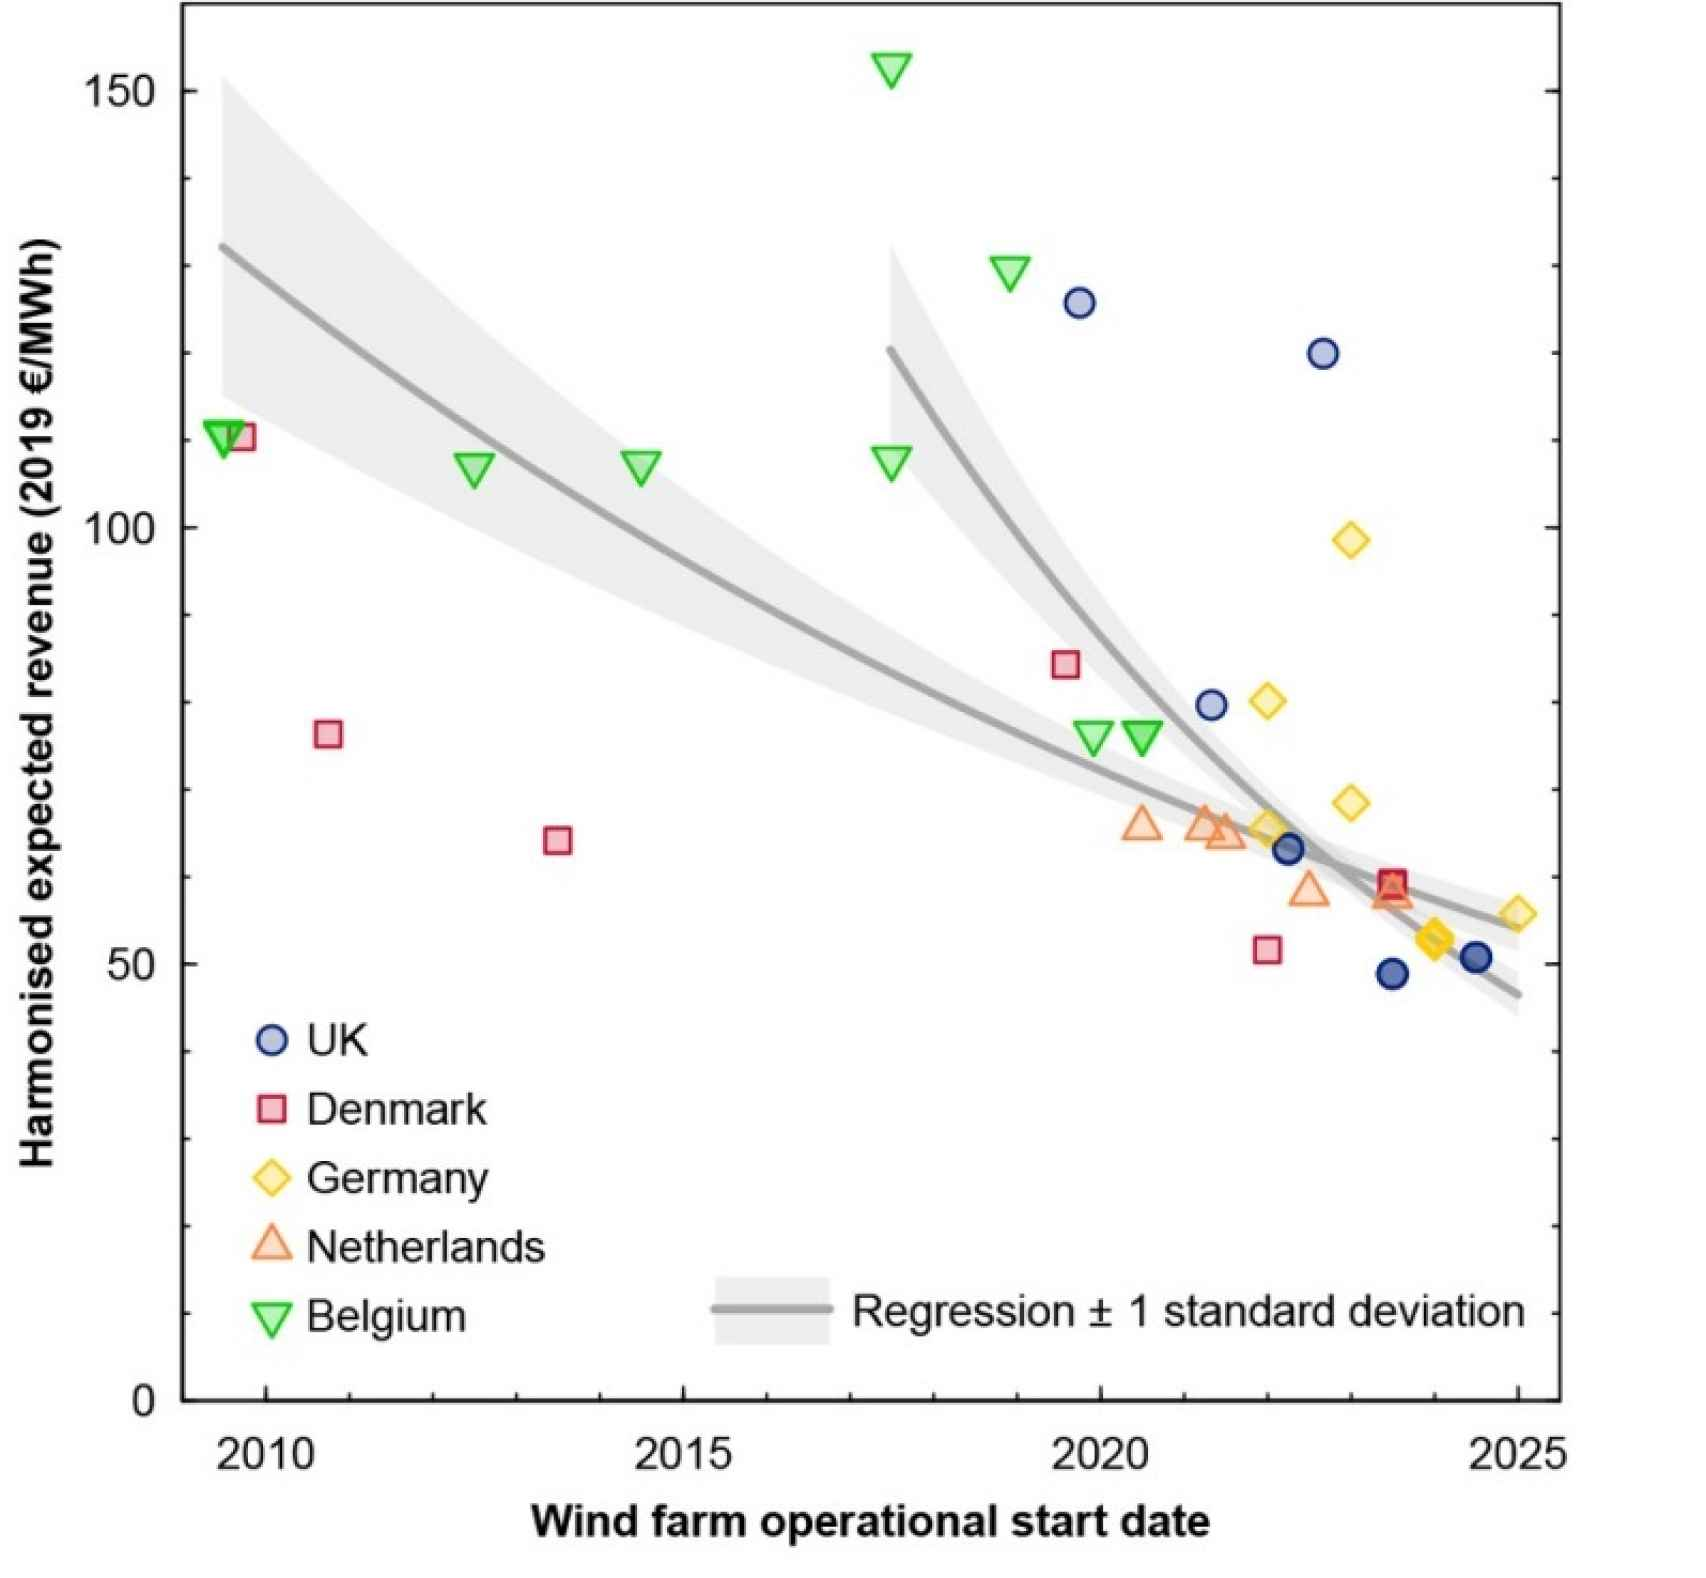 Ingresos esperados armonizados para cada parque eólico marino subastado en Europa. Jansen et al. (2020)